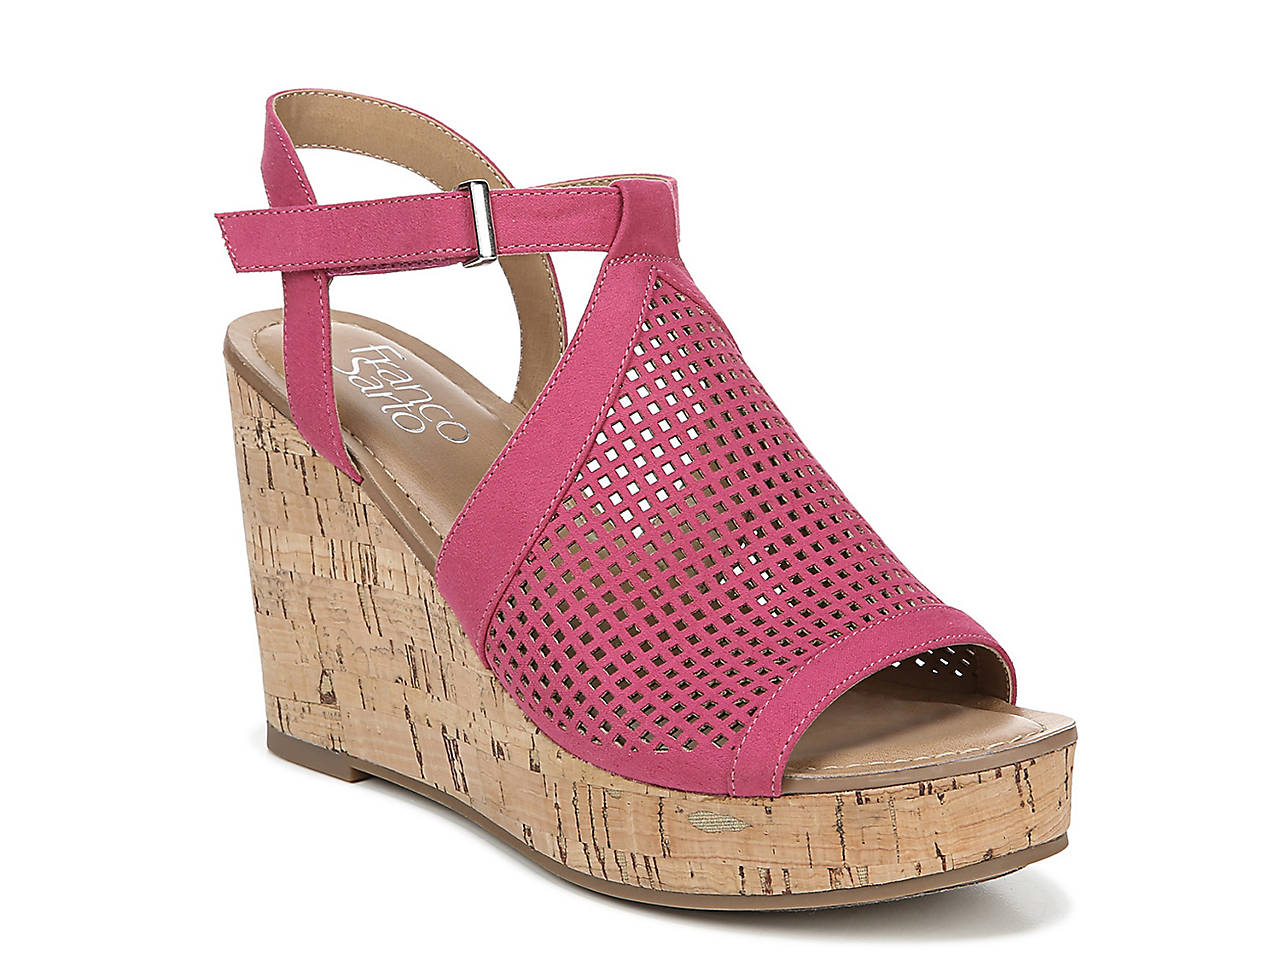 66ef04544225 Franco Sarto Canyon Wedge Sandal Women's Shoes | DSW